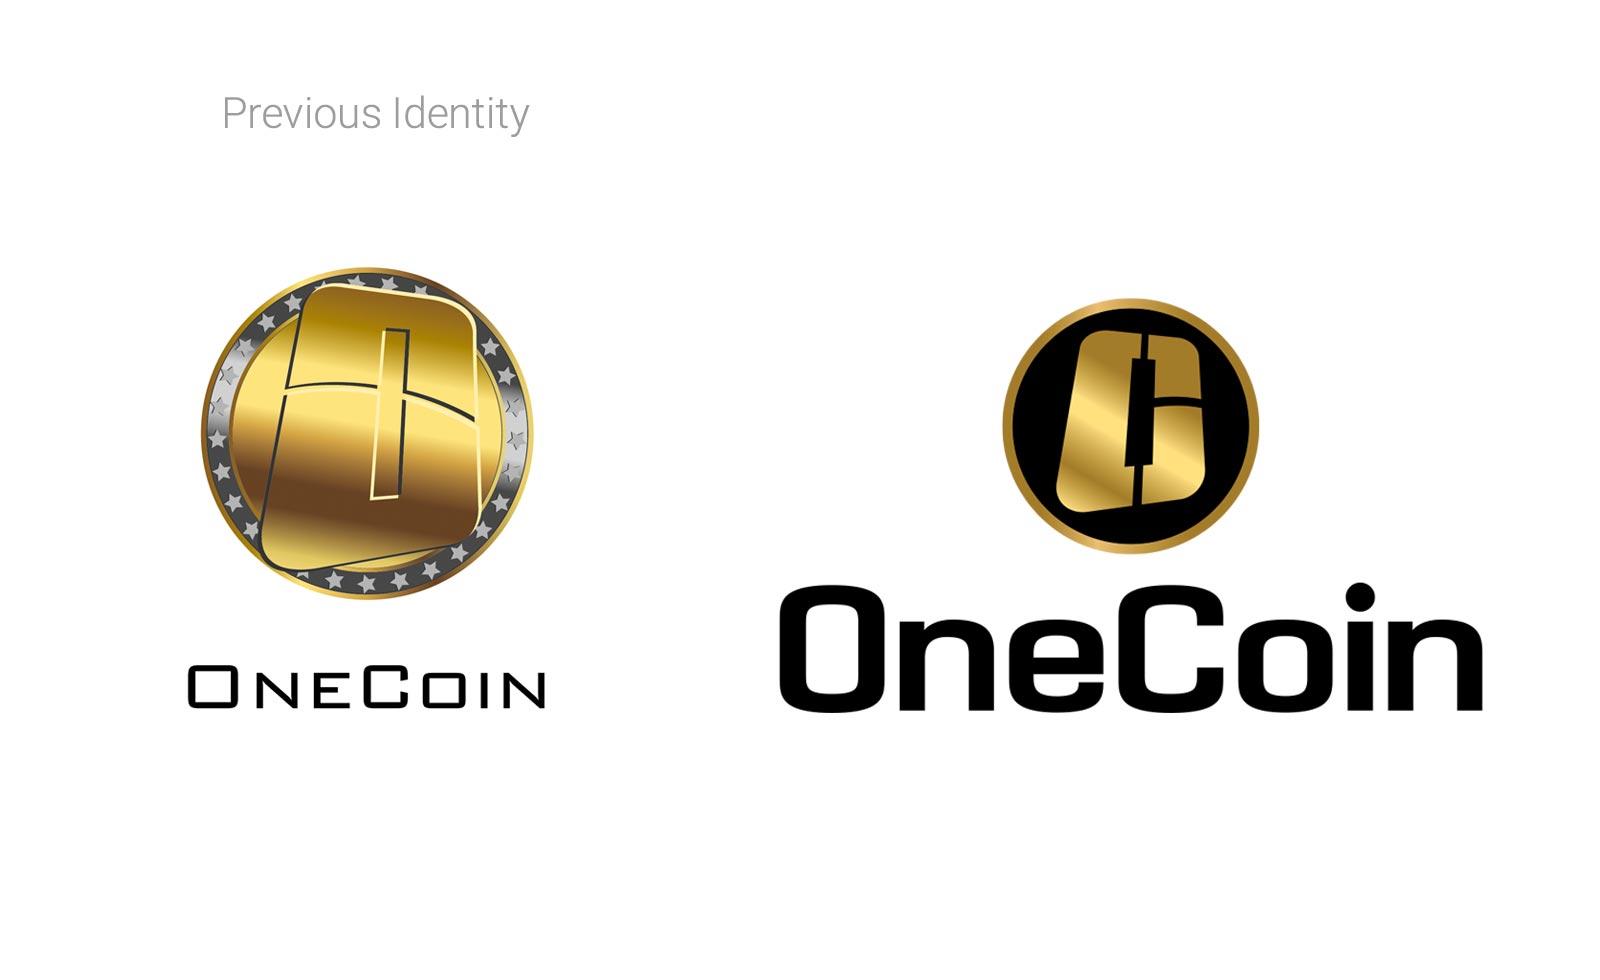 onecoin brandmark redesign cryptocurrency